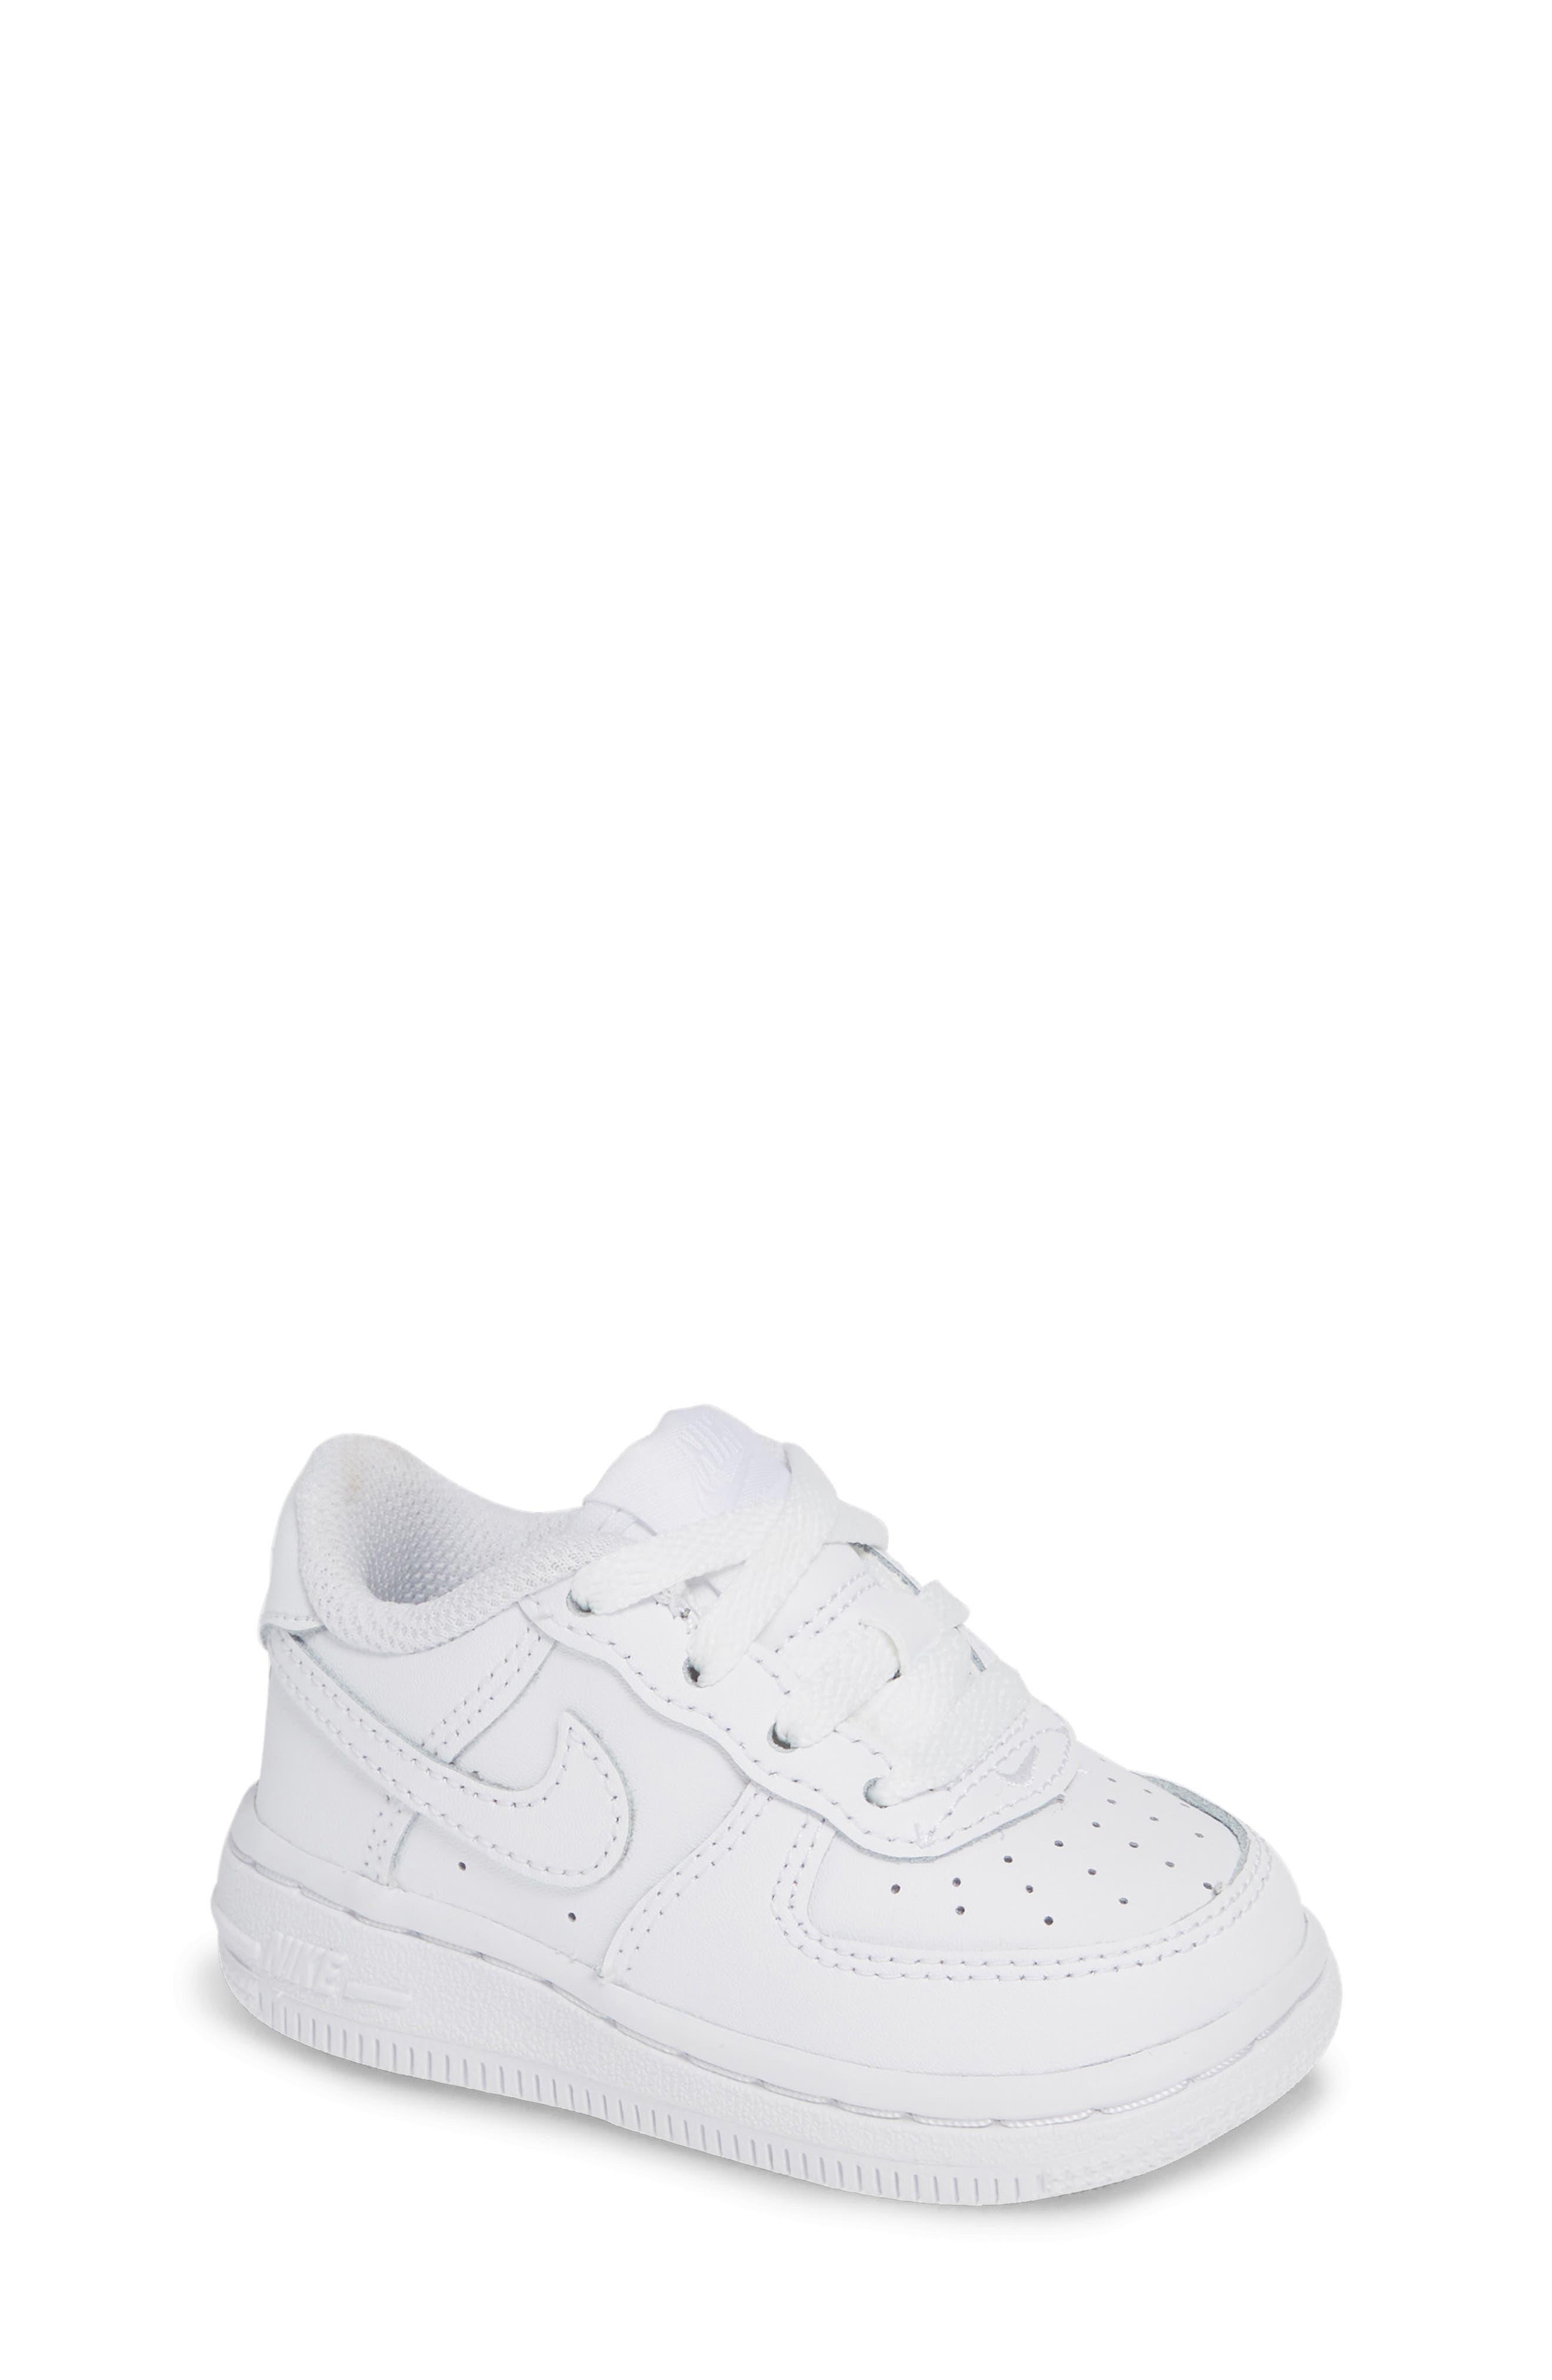 NIKE, Air Force 1 Sneaker, Main thumbnail 1, color, WHITE